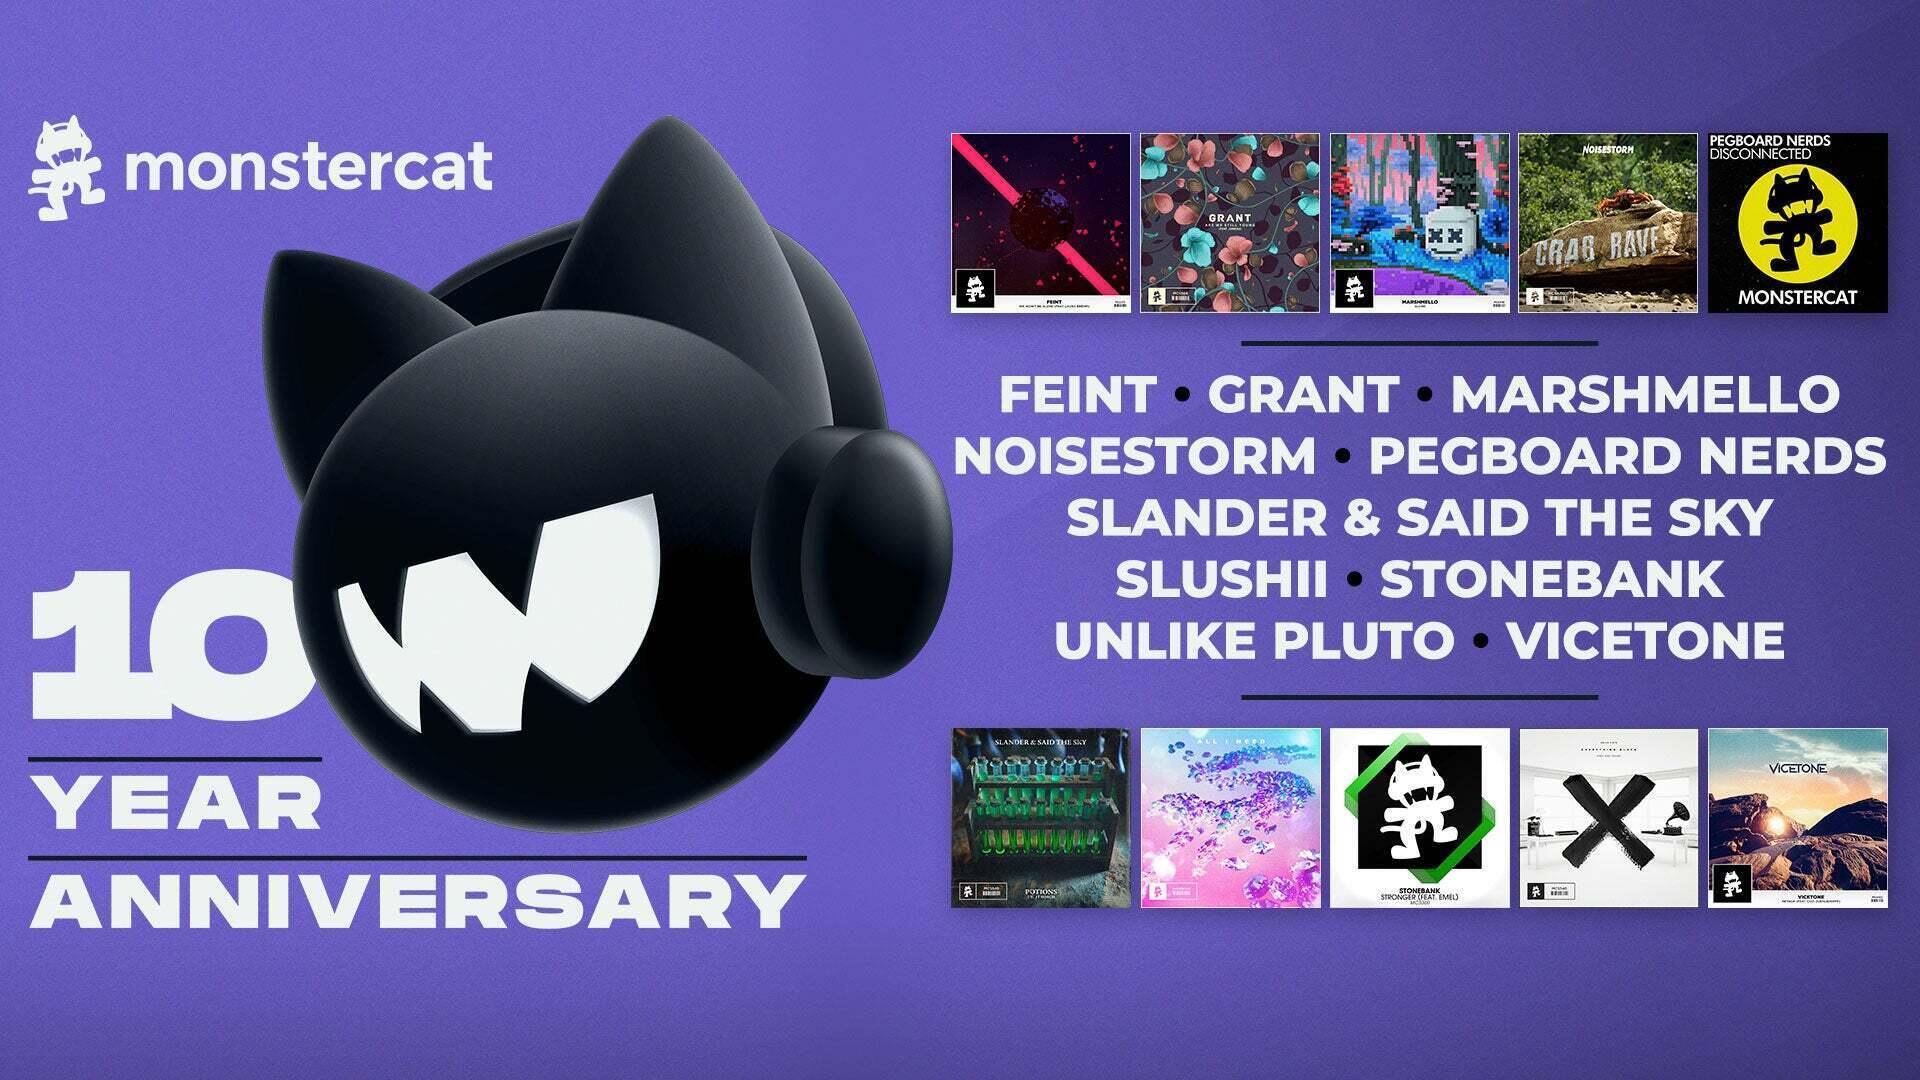 Rocket League Celebrates Monstercat's 10 Year Anniversary Image